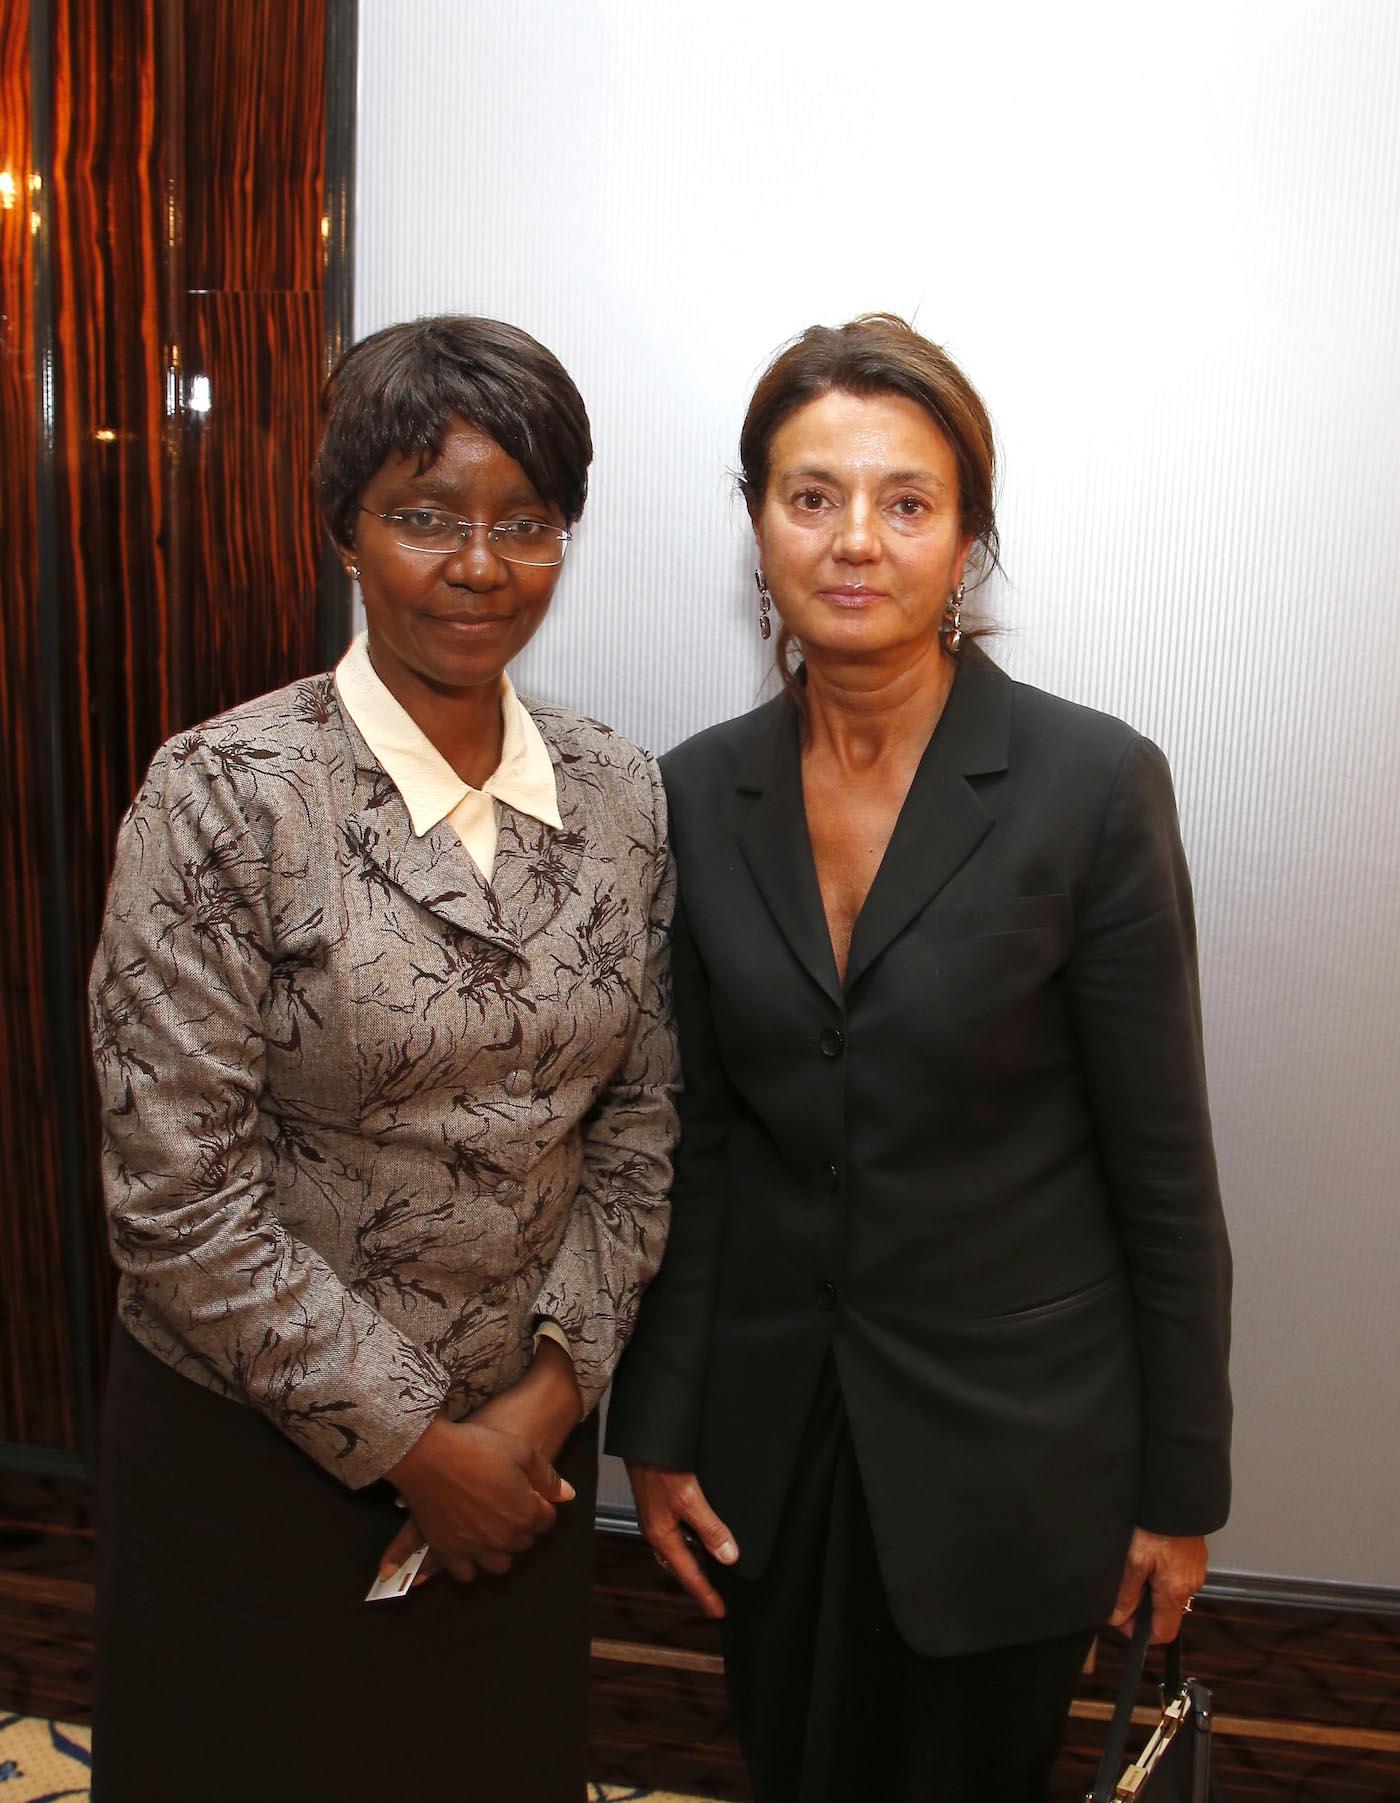 I.E. Ruth Masodzi Chikwira (Botschafterin Simbabwe), Prof. Dr. Margarita Mathiopoulos bei der Ambassadors Club Veranstaltung -Women for Peace- im MARITIM Hotel Berlin.